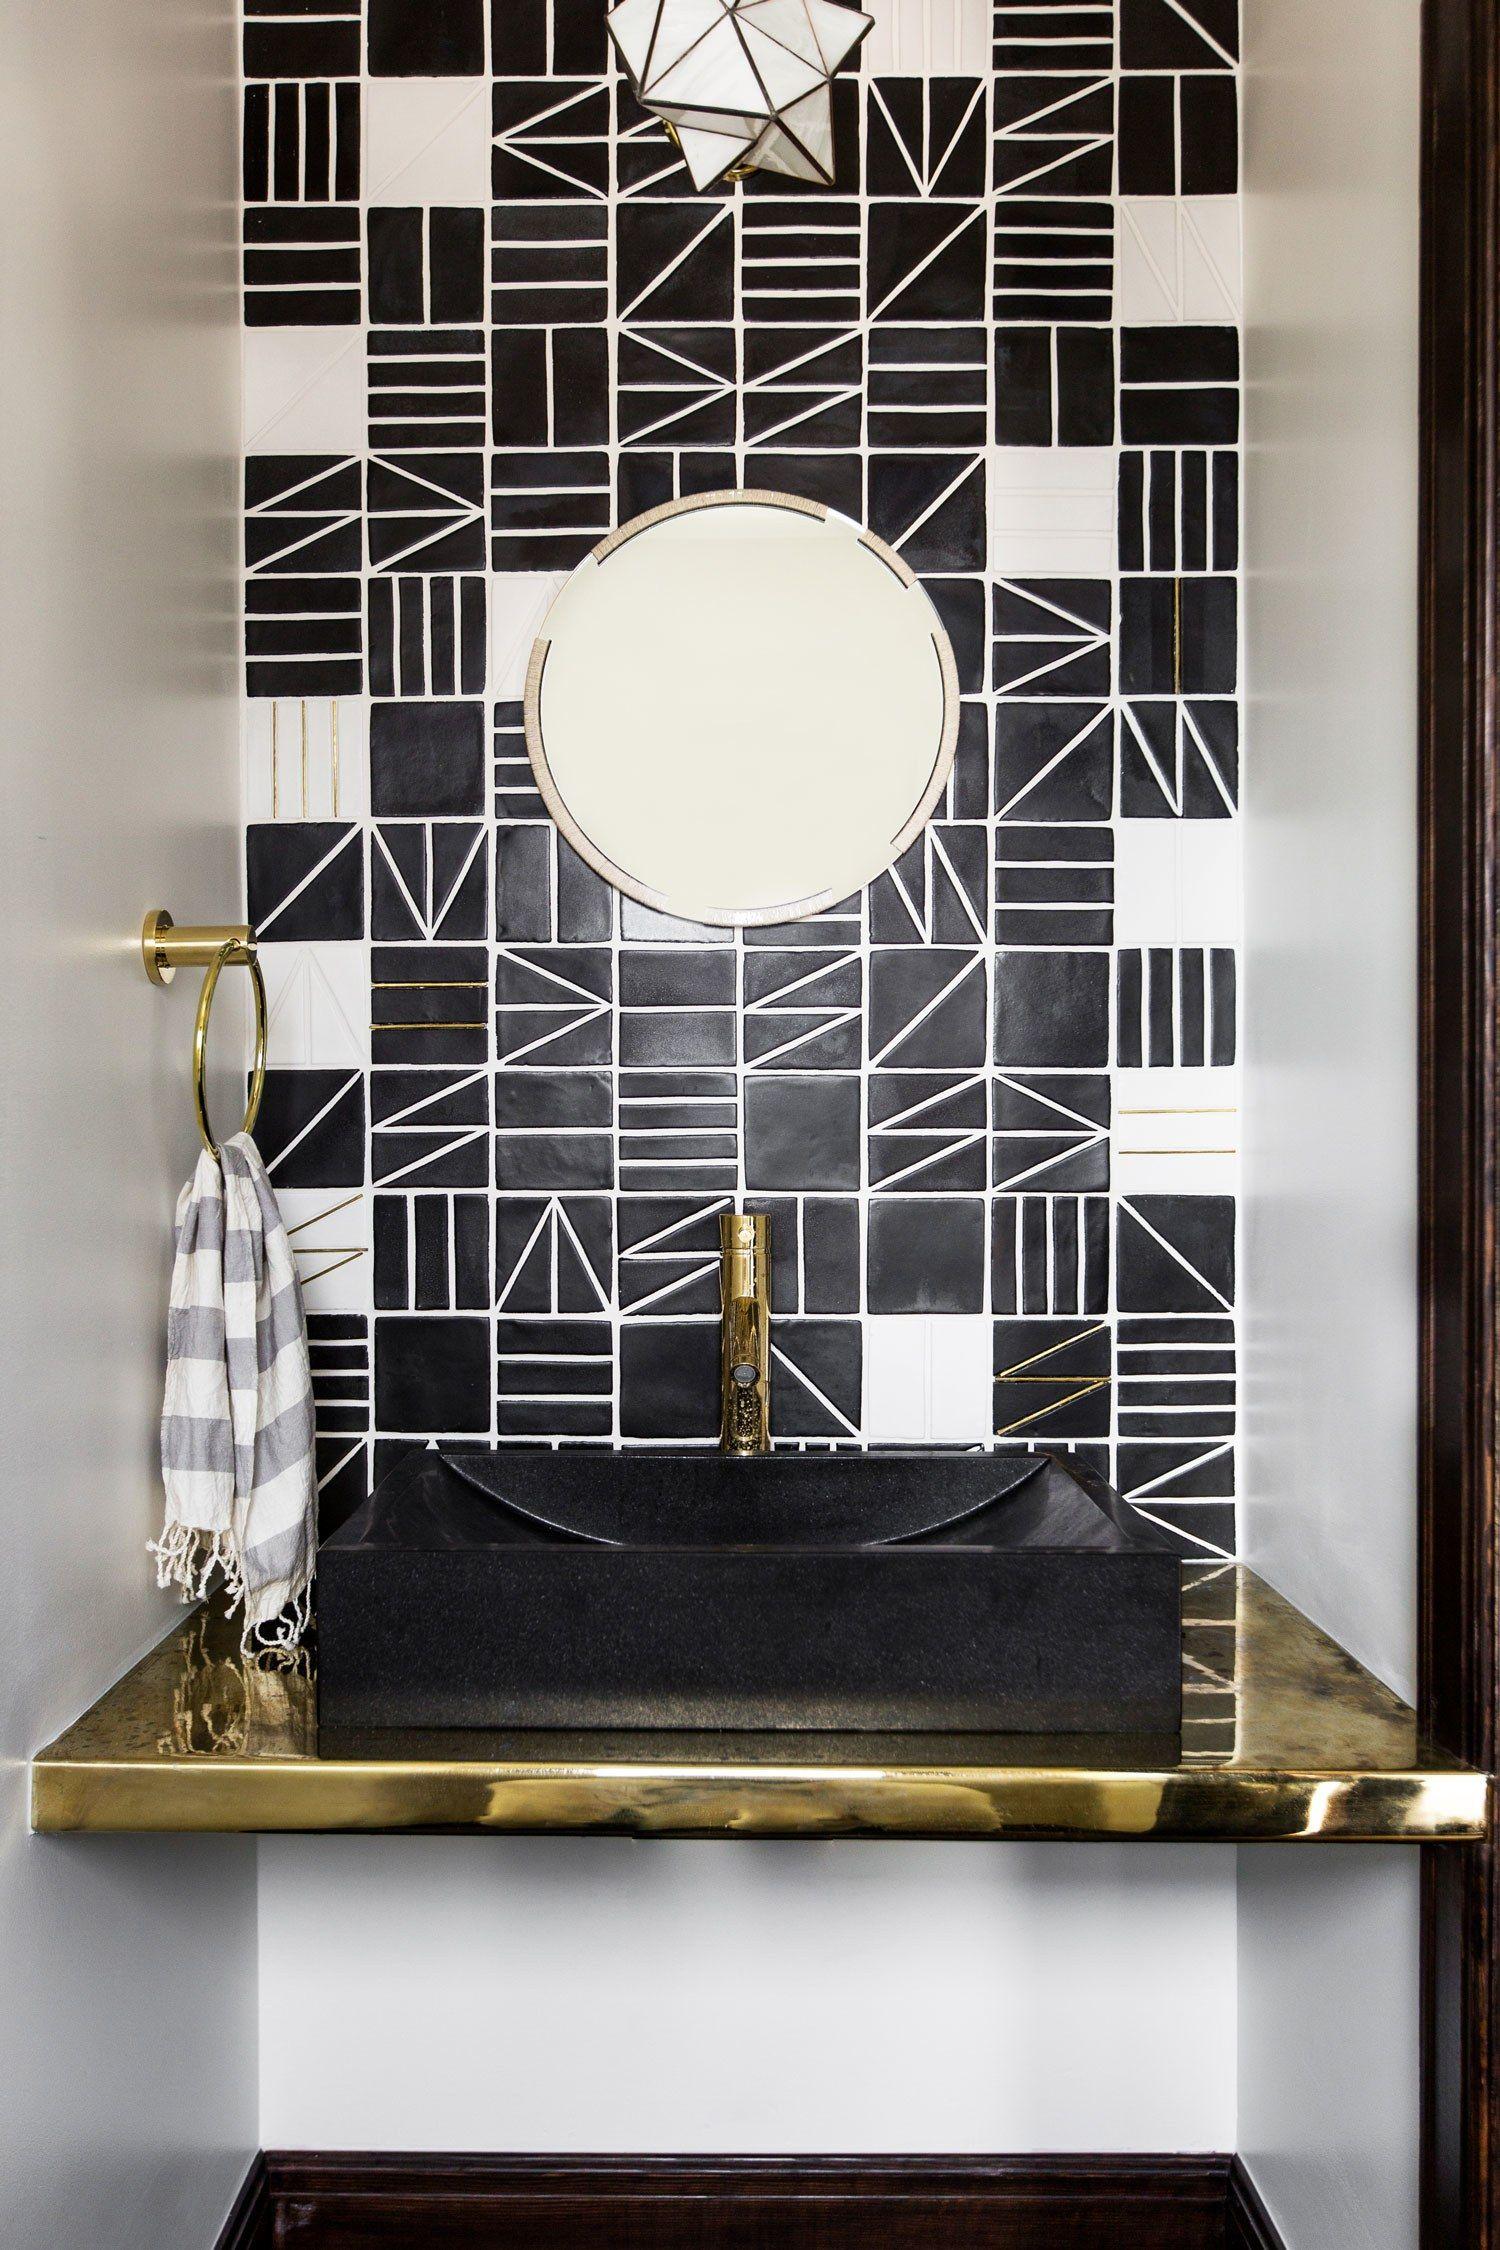 tour a hollywood composer s 1920s l a bungalow bathrooms modern pinterest badezimmer. Black Bedroom Furniture Sets. Home Design Ideas